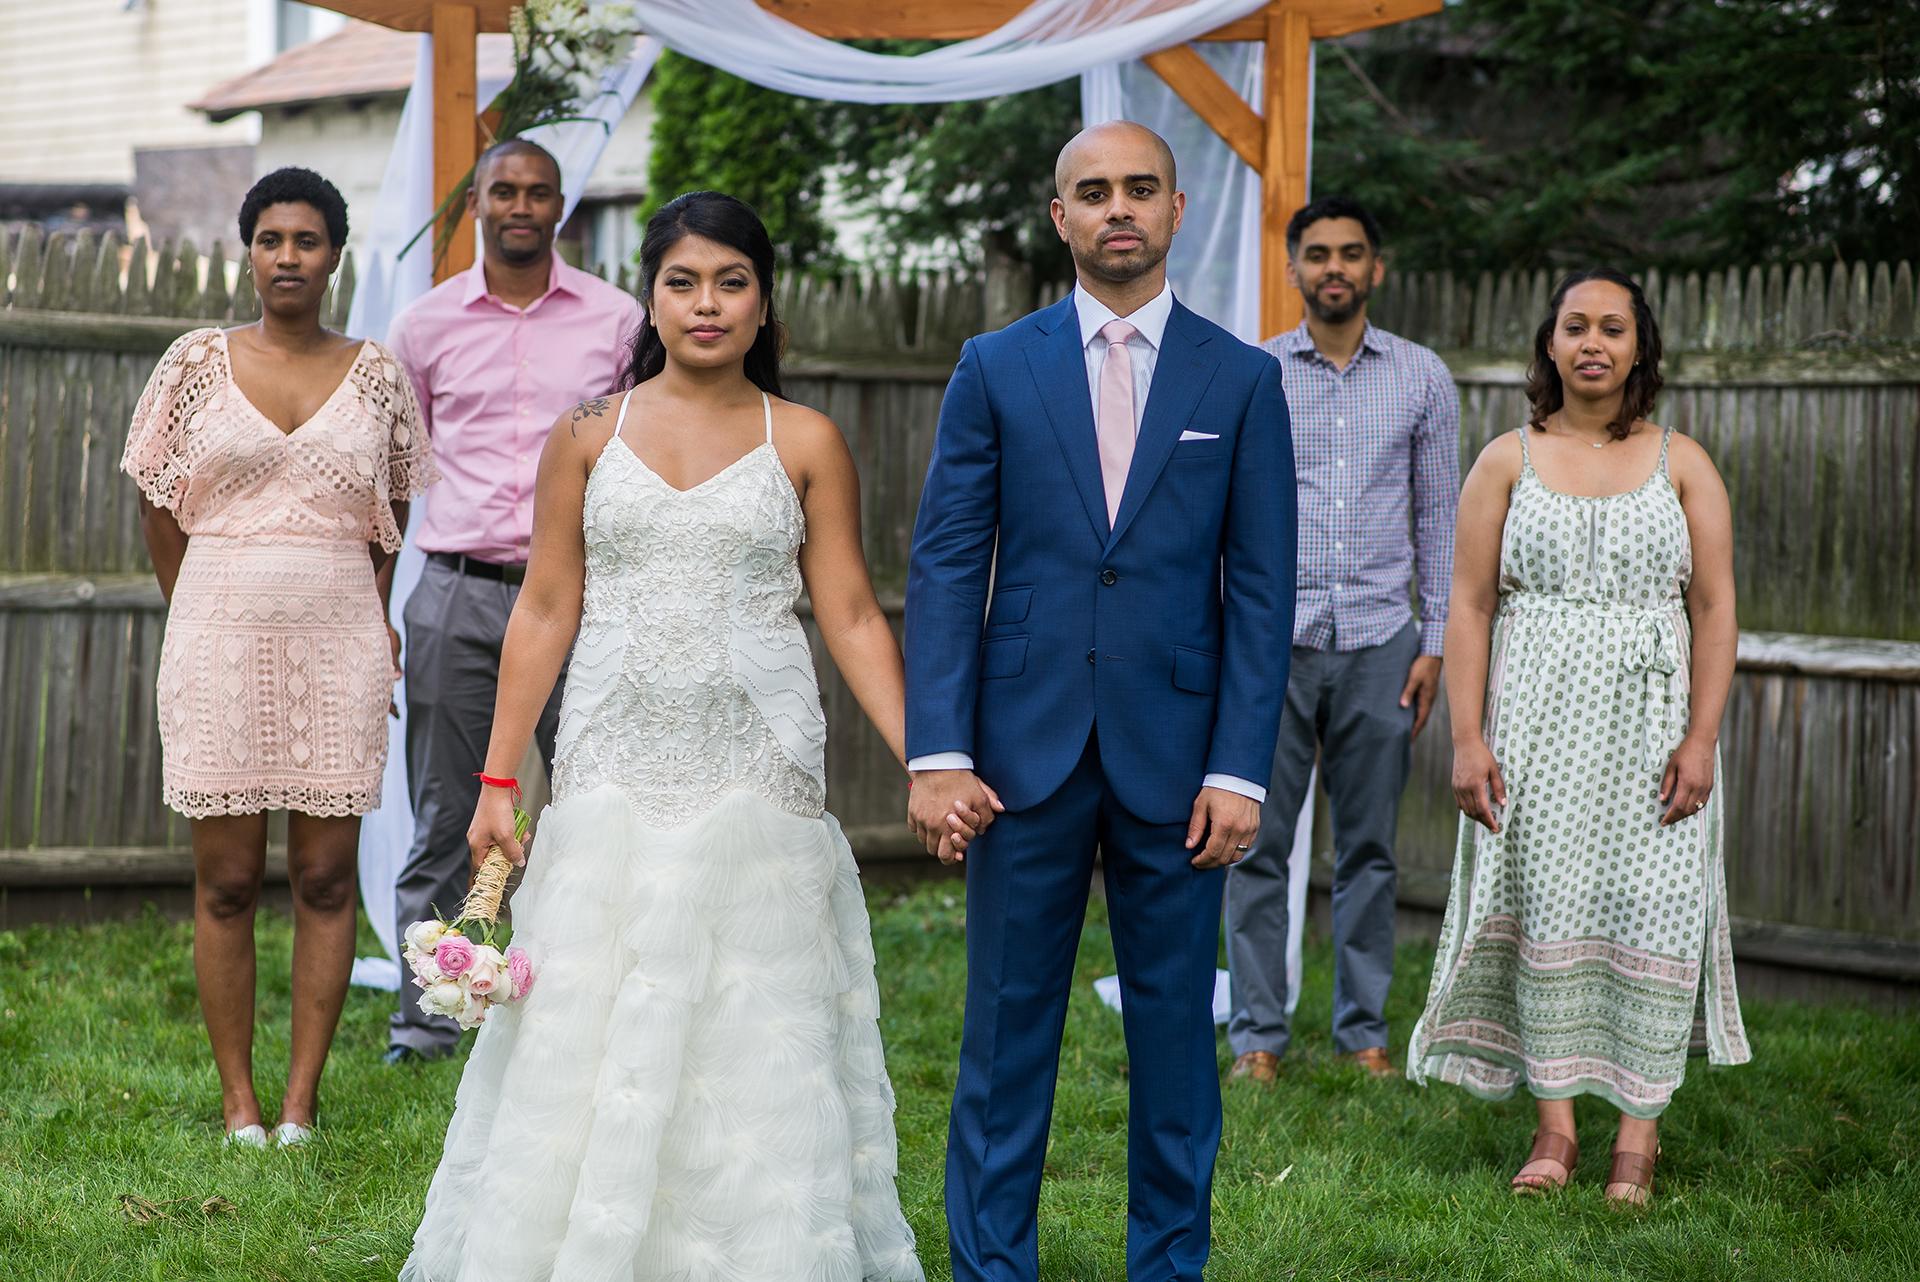 bory-wedding.jpg